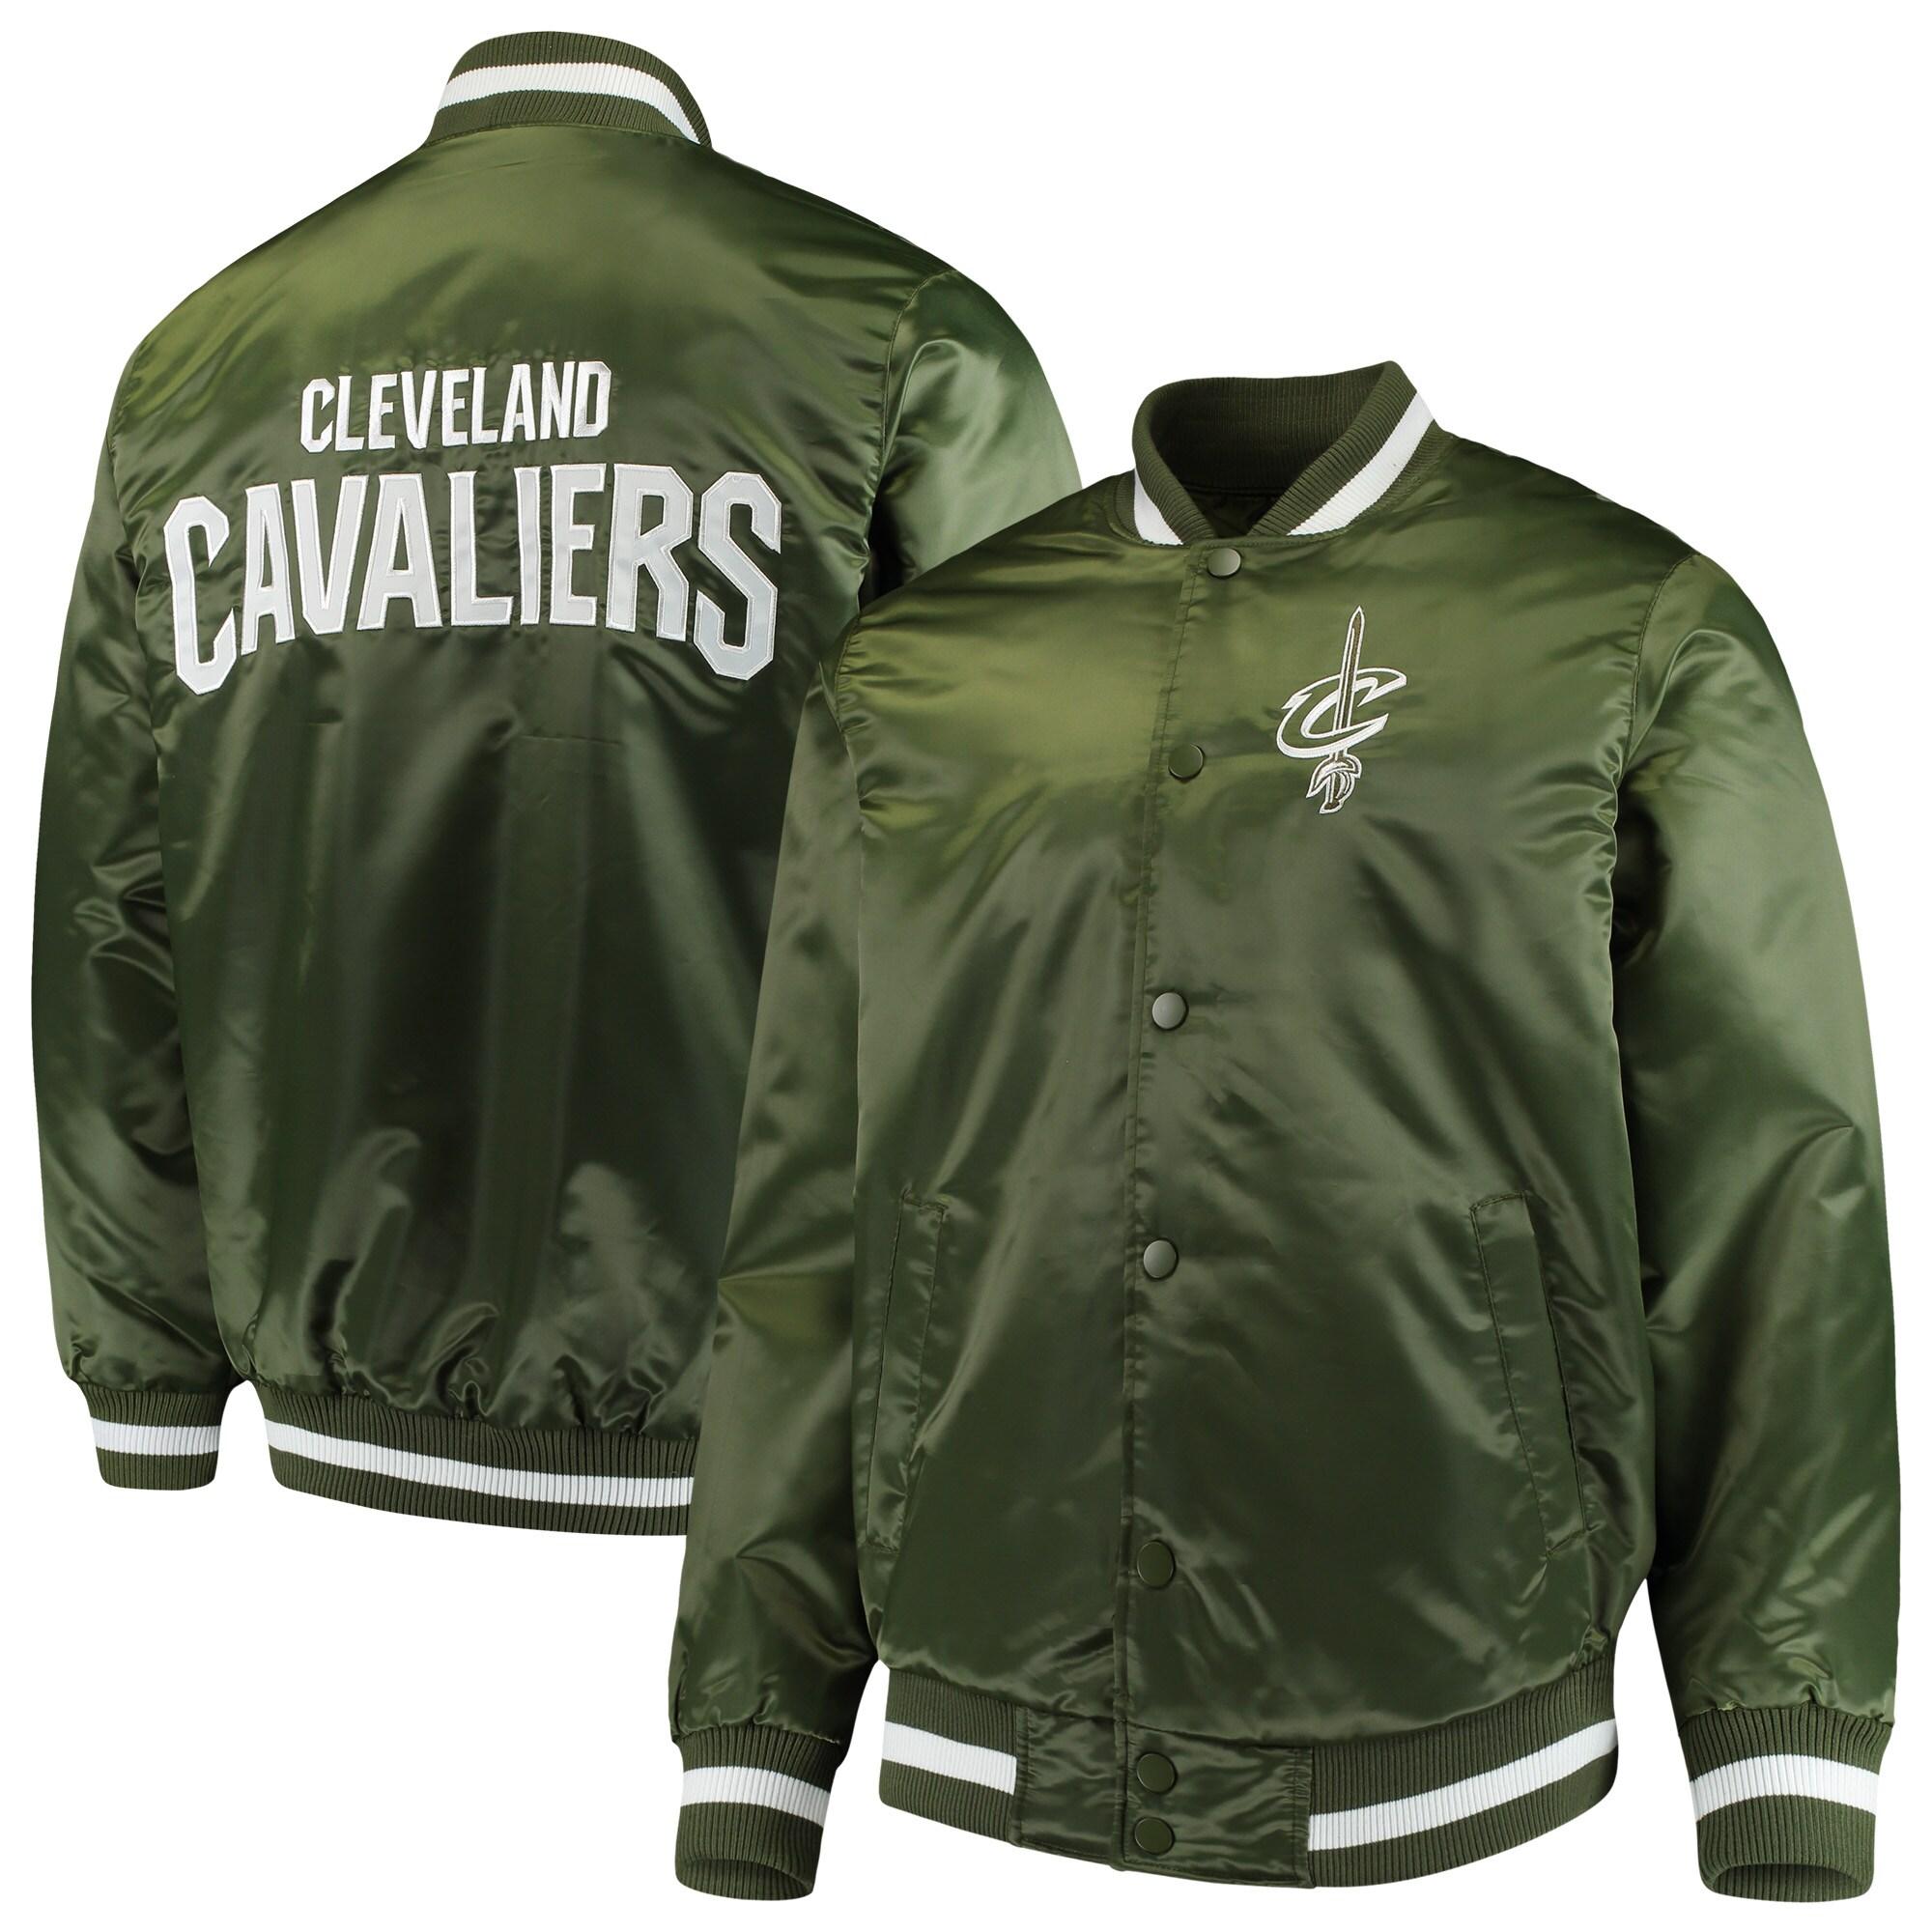 Cleveland Cavaliers Starter Satin Full-Snap Jacket - Green